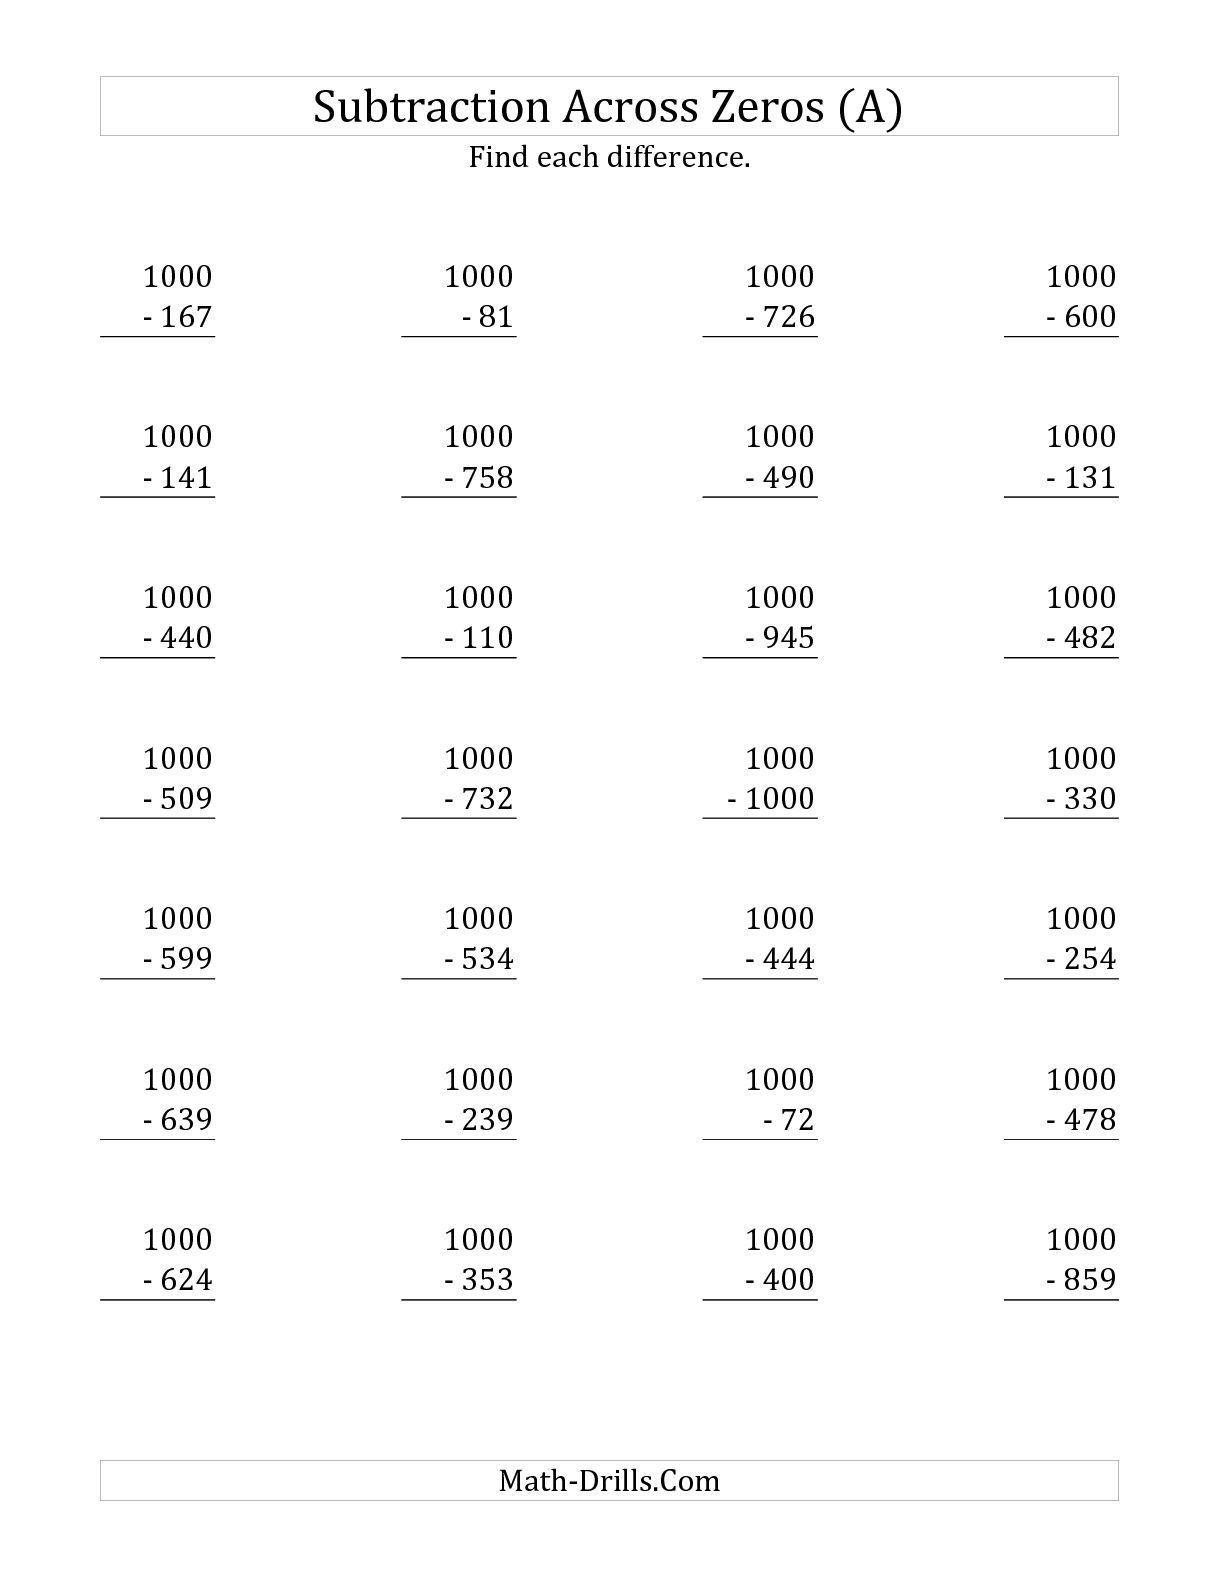 The Subtracting Across Zeros From 1000 A Math Worksheet From The Subtraction Worksheet Page At Math Worksheets Free Math Worksheets Subtraction Across Zeros [ 1584 x 1224 Pixel ]